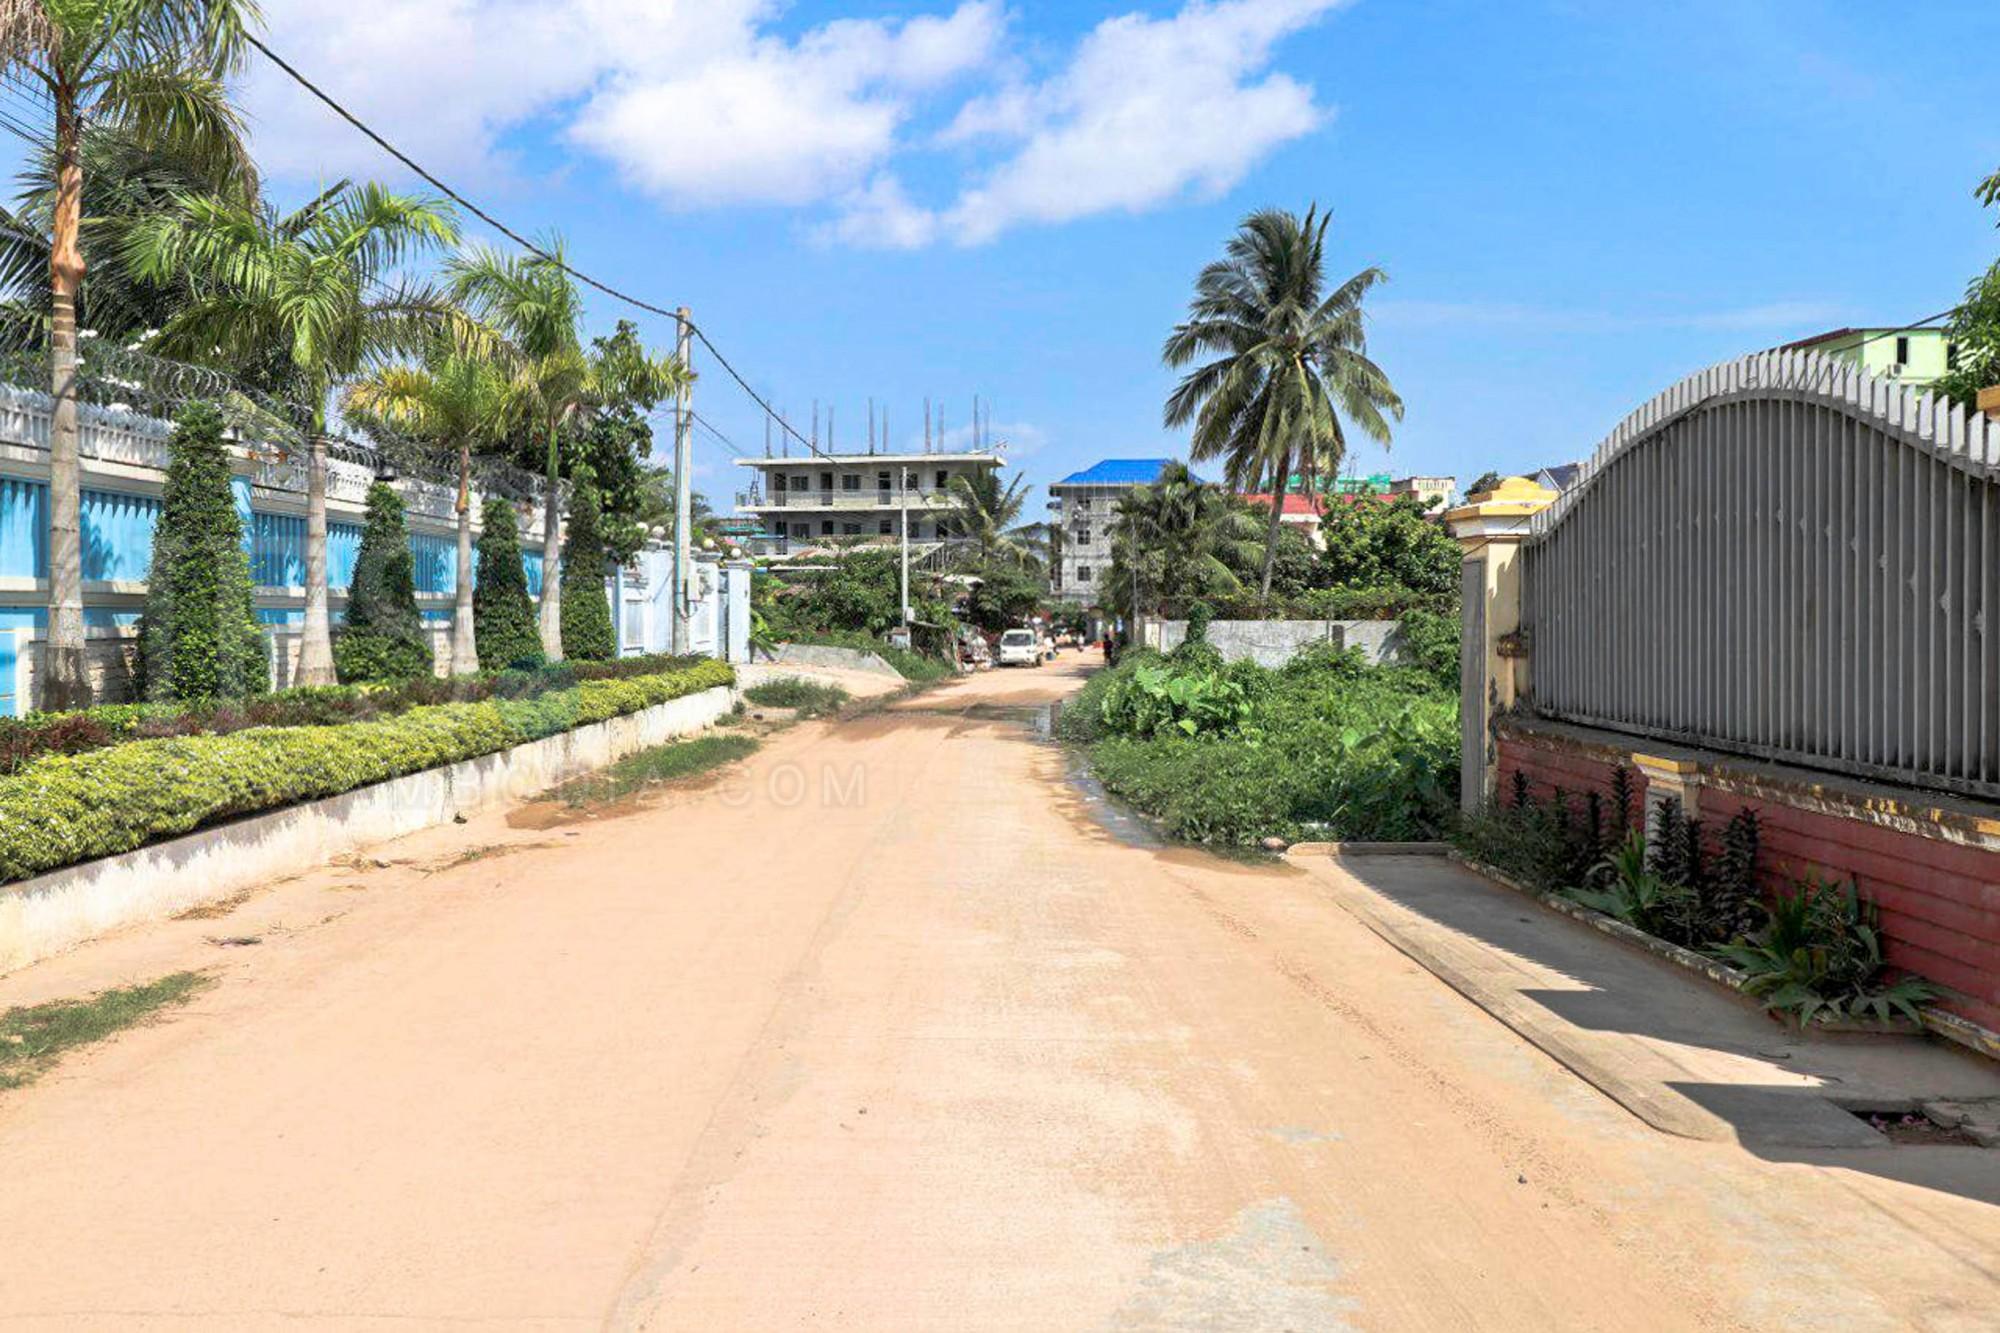 5 Bedroom House For Sale - Mittapheap, Sihanoukville